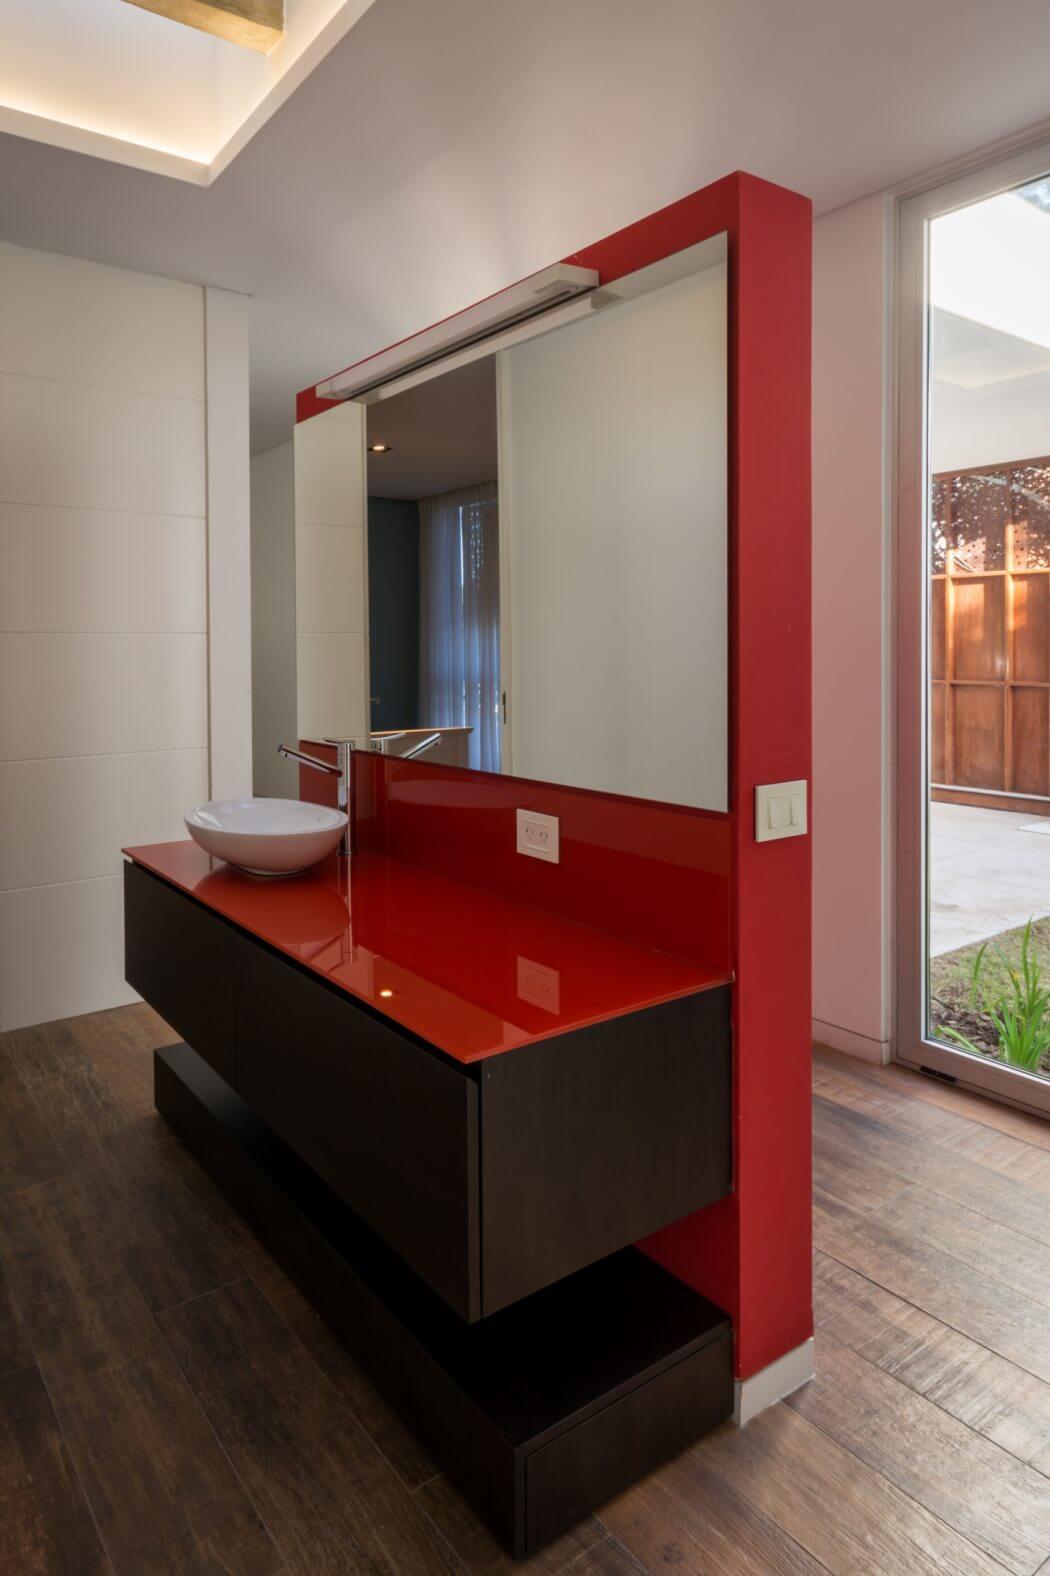 024-mooe-house-fcp-arquitectura-1050x1576